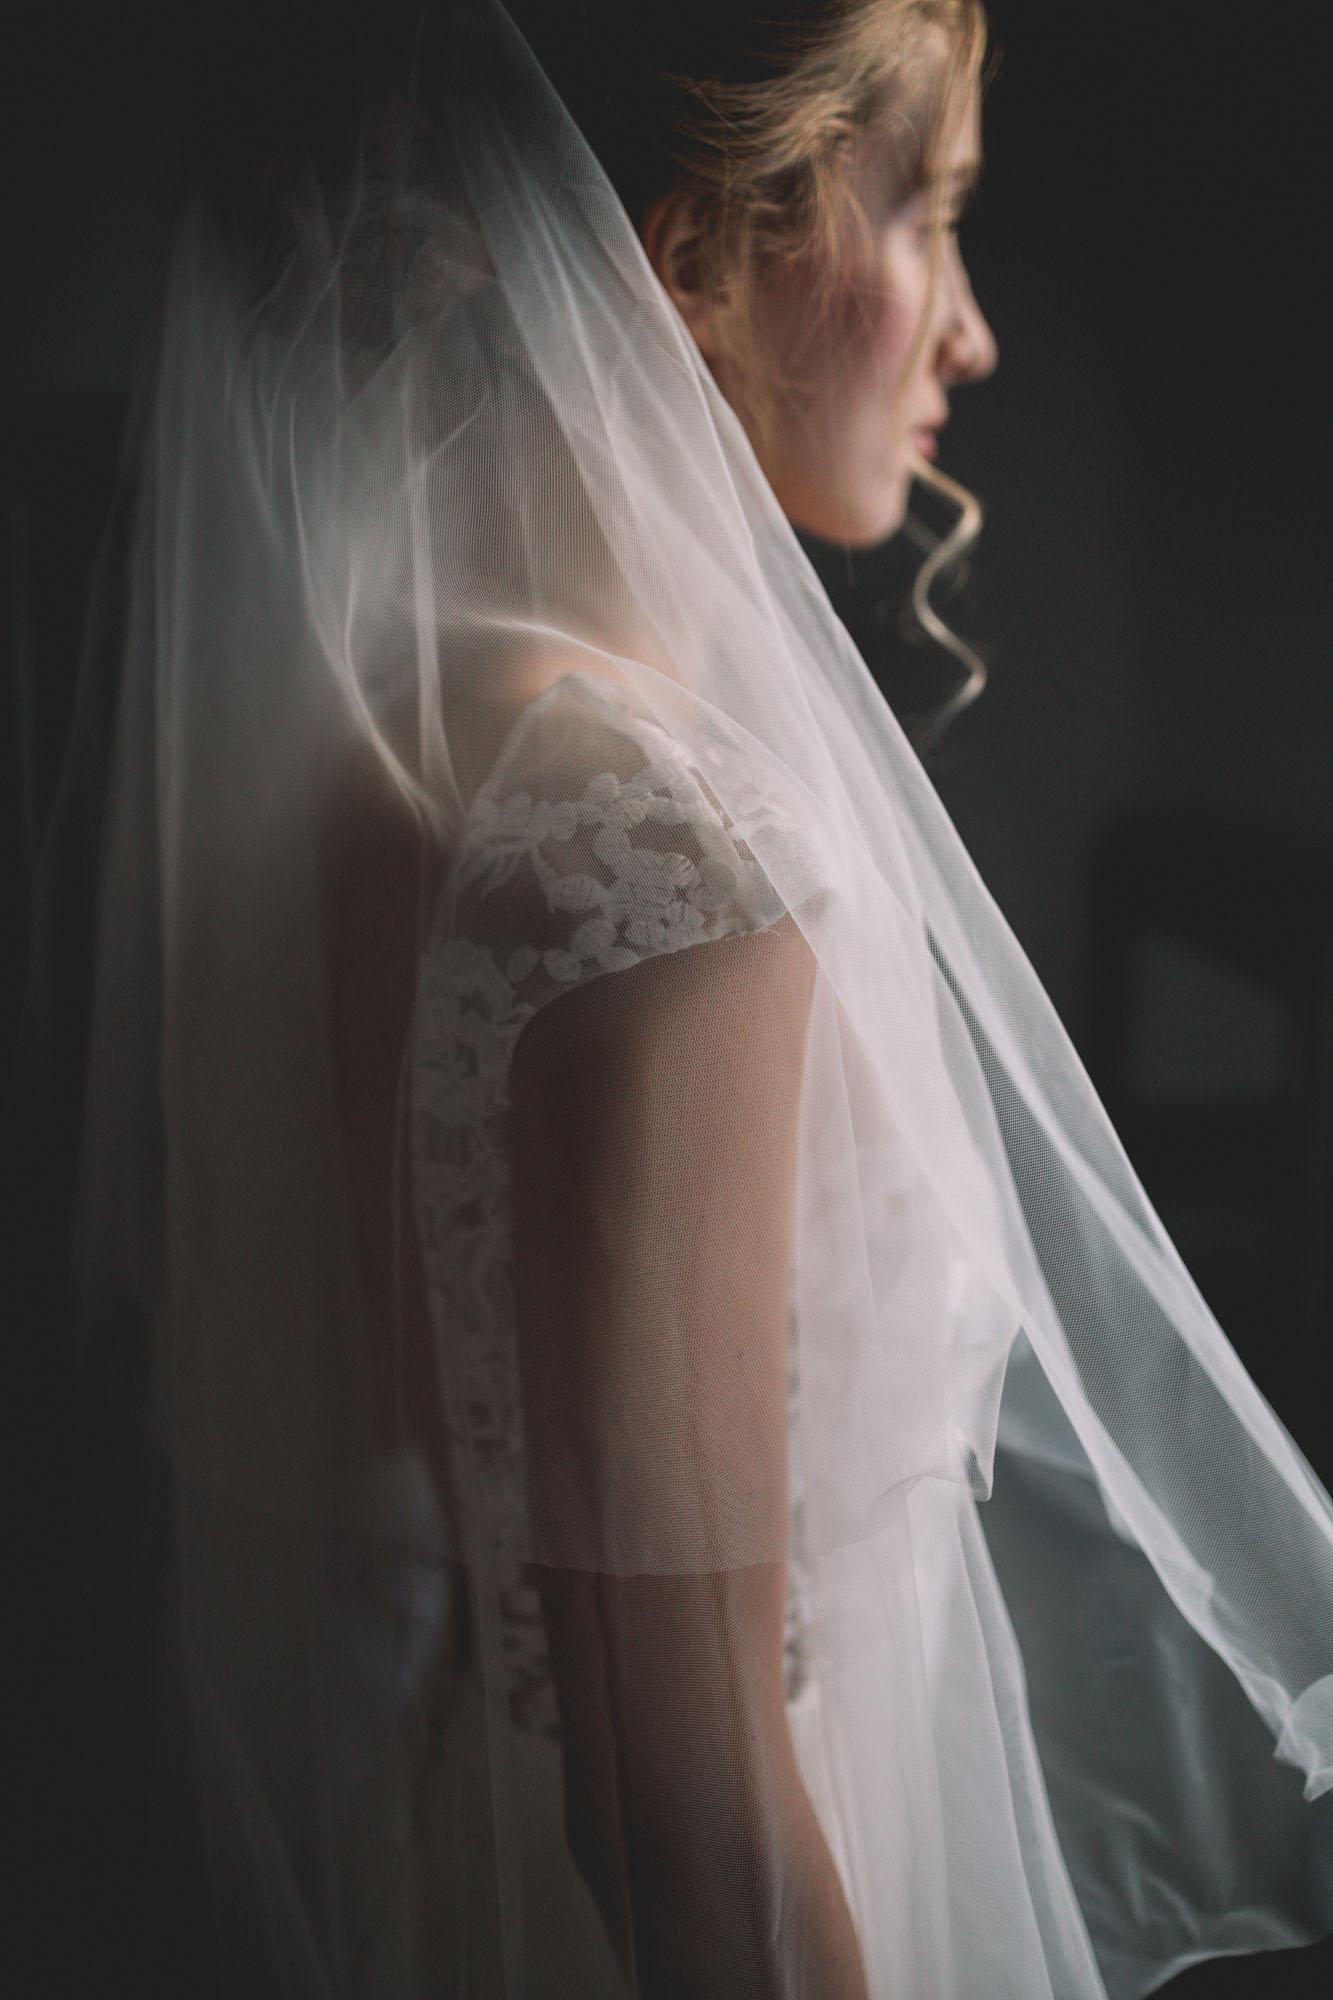 JEANNE SOURCE_DEFILE_COEUR SAUVAGE_PHOTOGRAPHE_MARIAGE_LES BANDITS-3